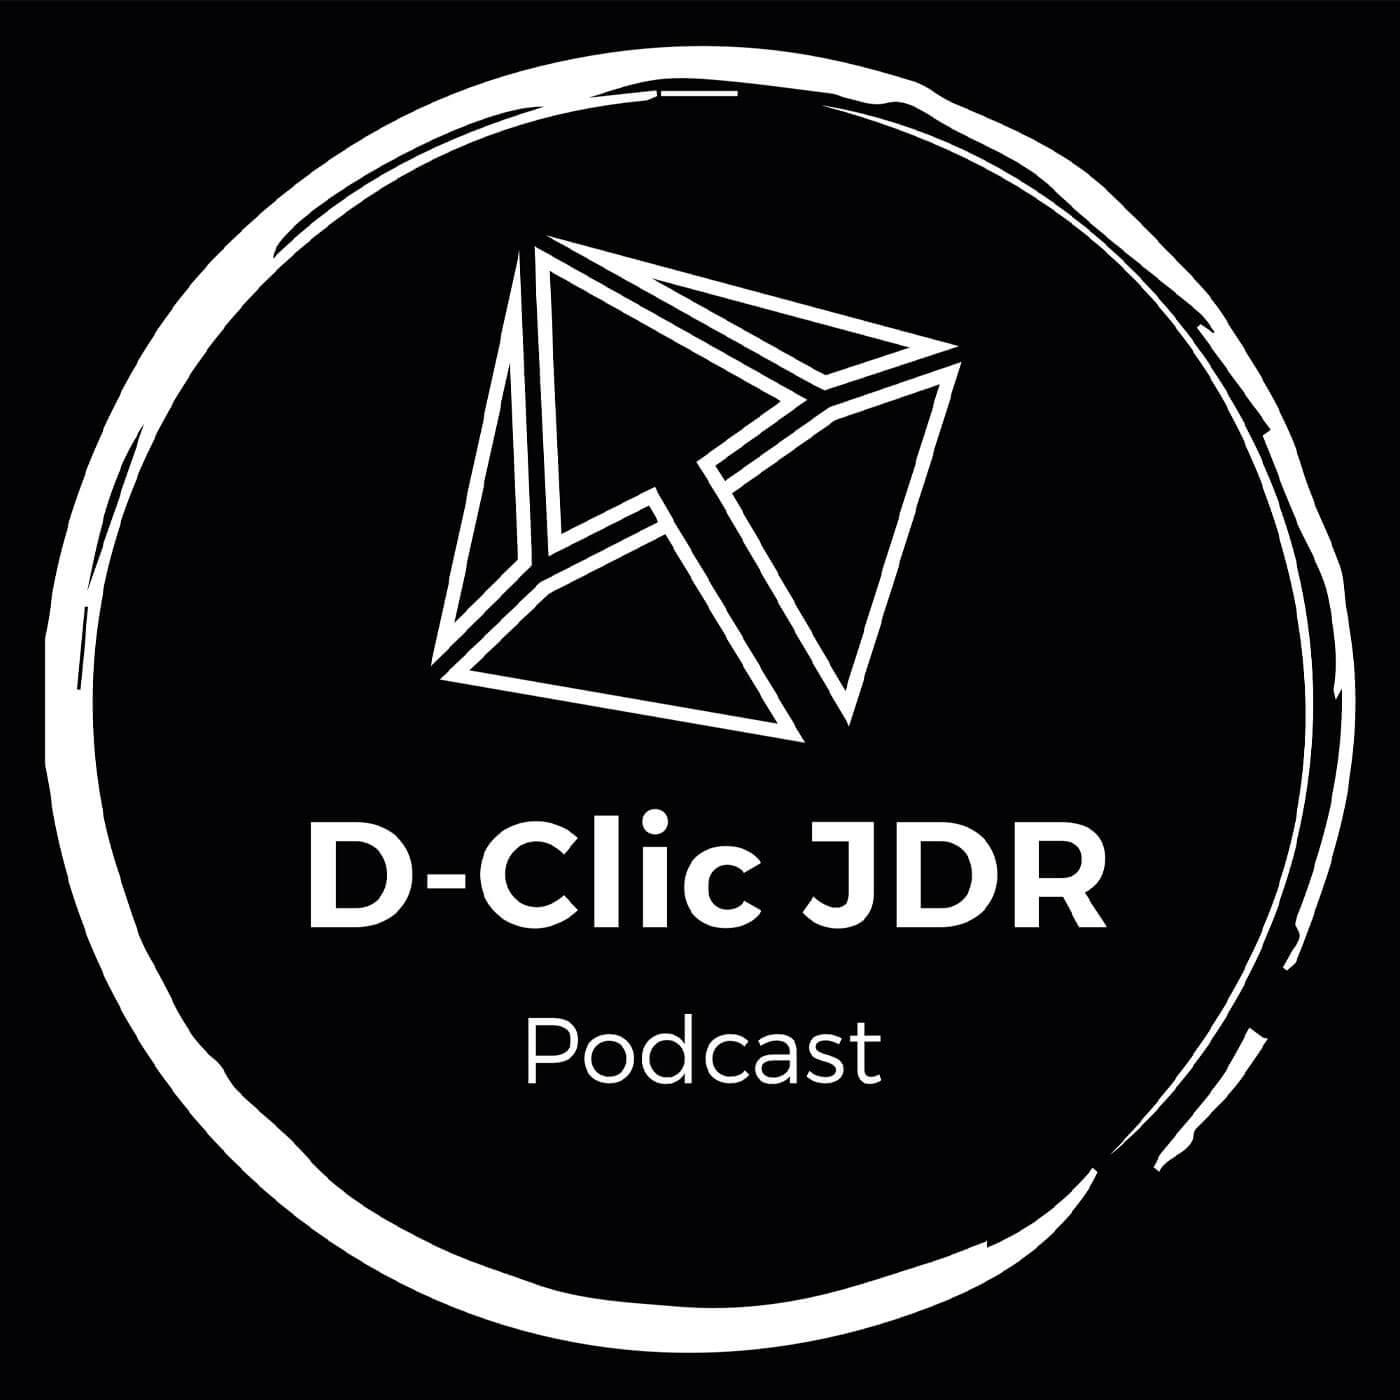 D-Clic JDR